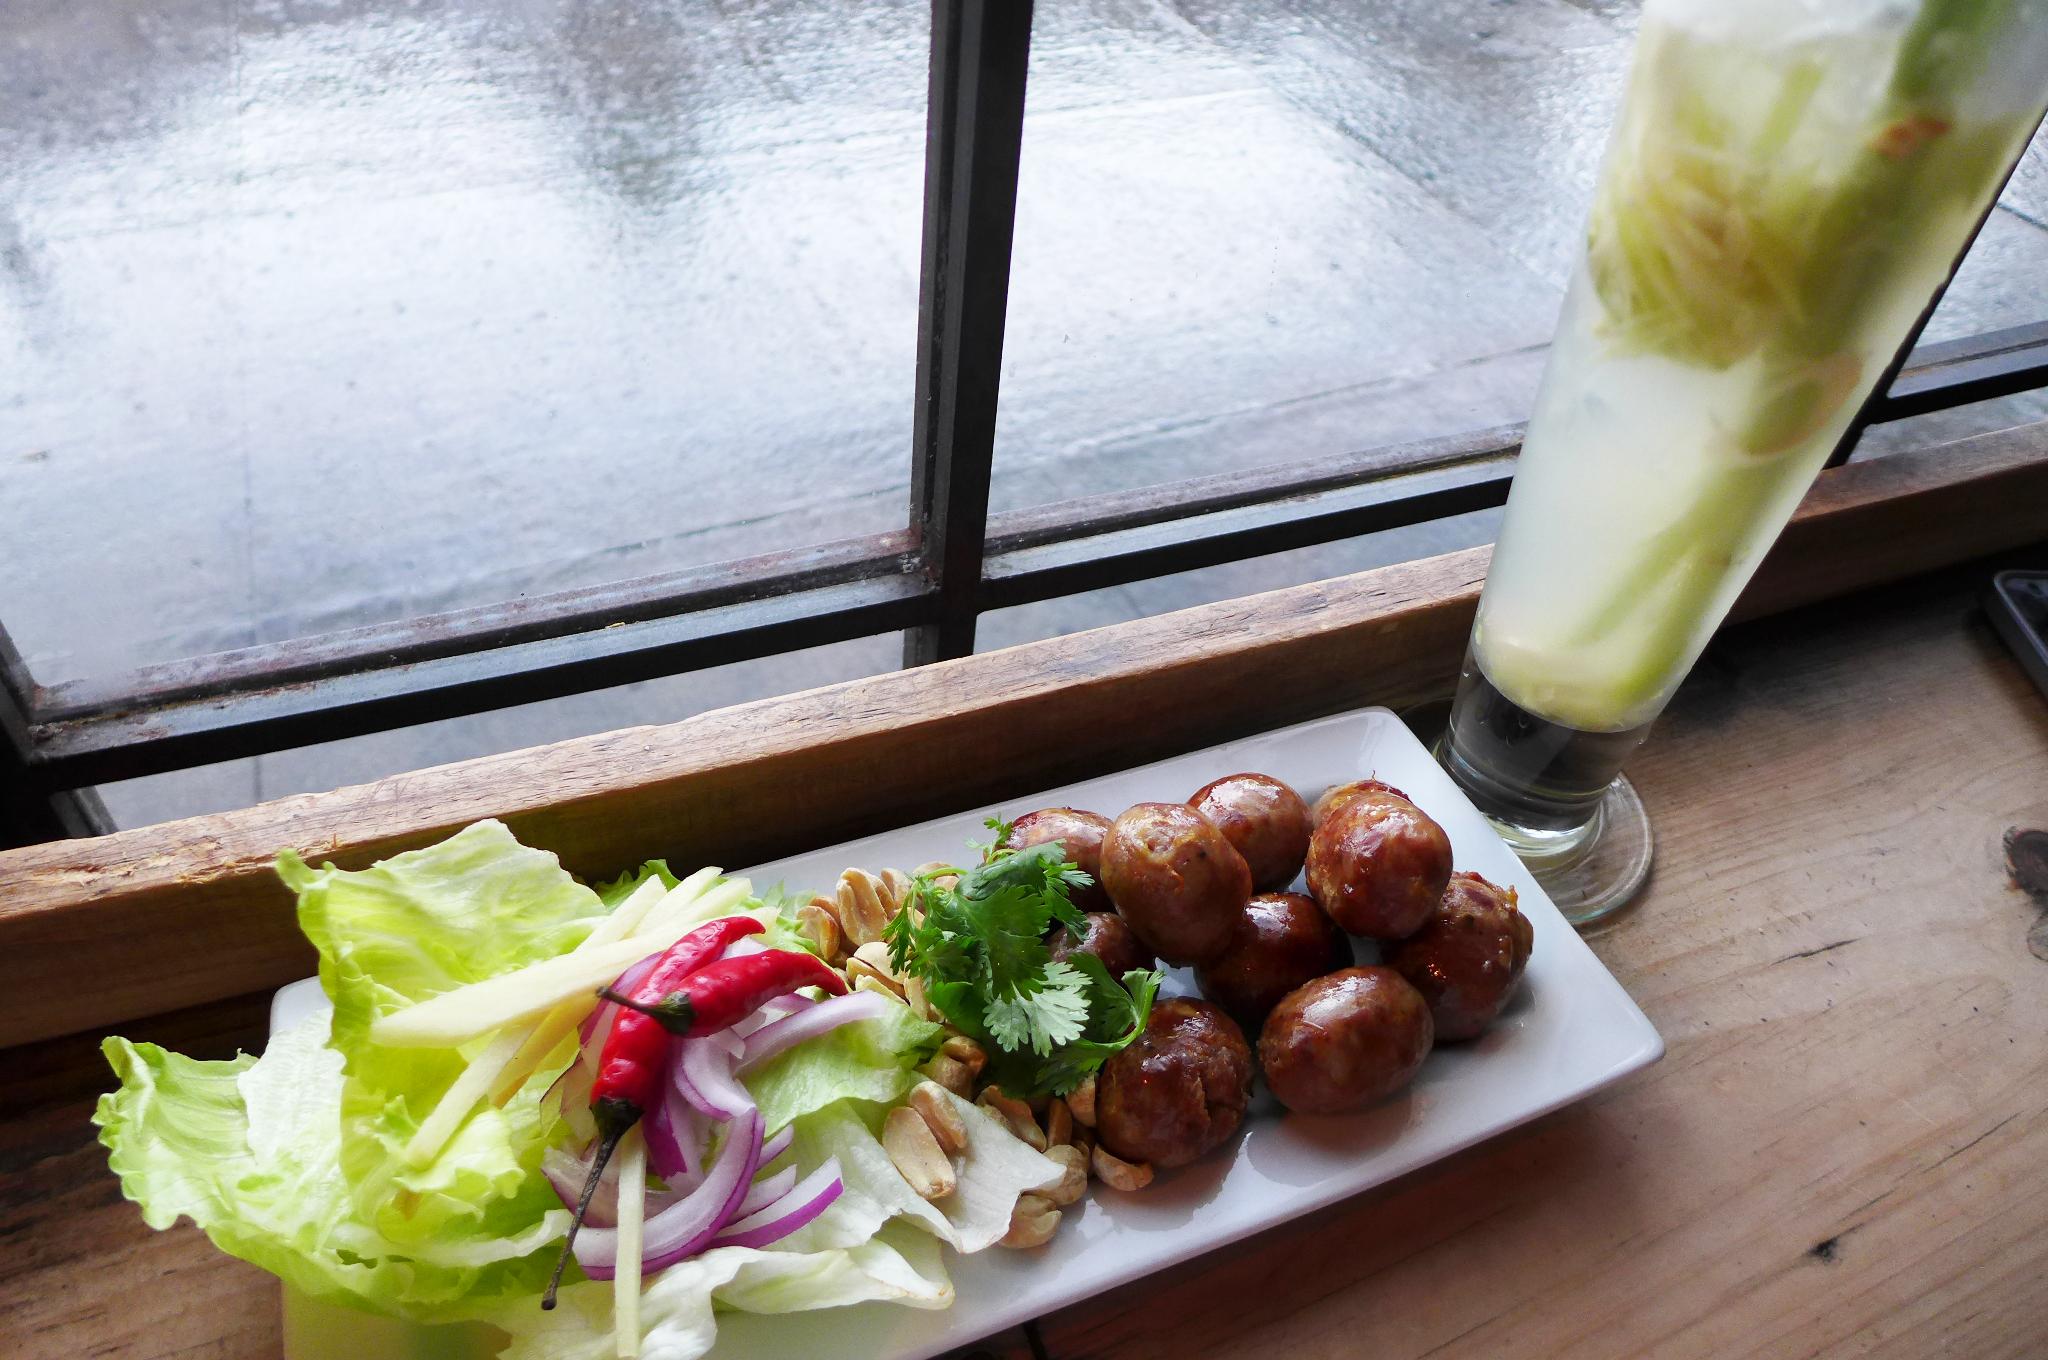 Elmhurst's Woodside Avenue Has Become Thai Food Nirvana